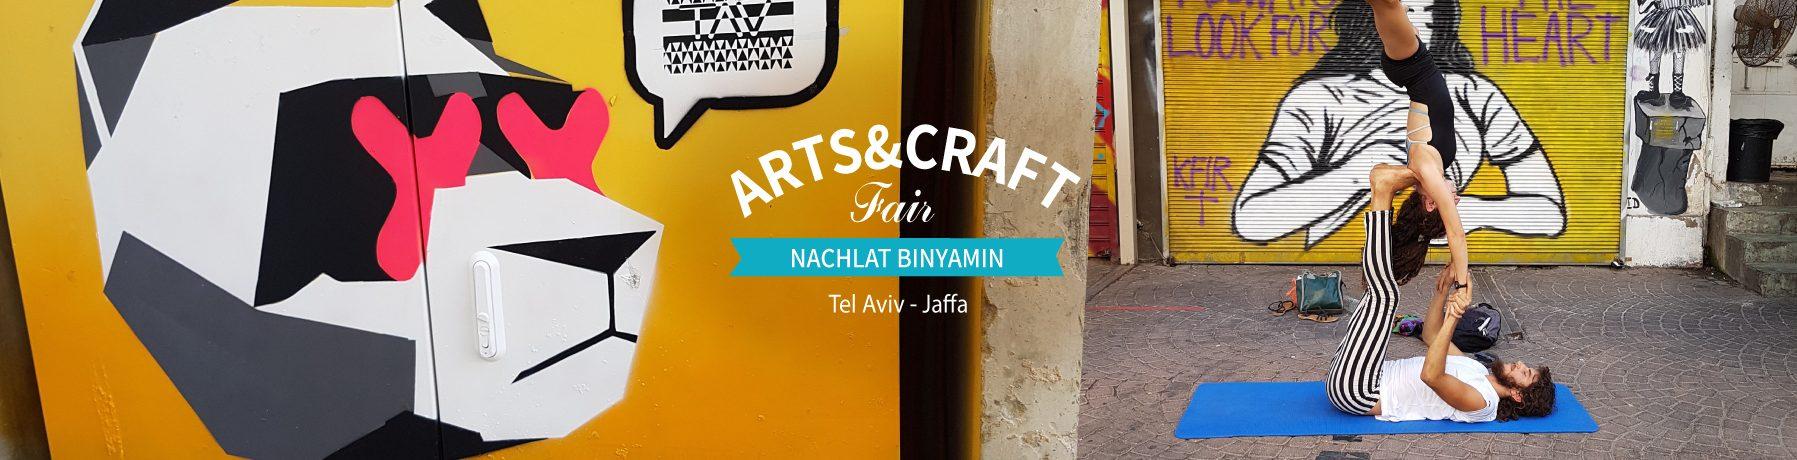 Artist&craft fair, Nachalat Binyamin, Tel Aviv Jaffa